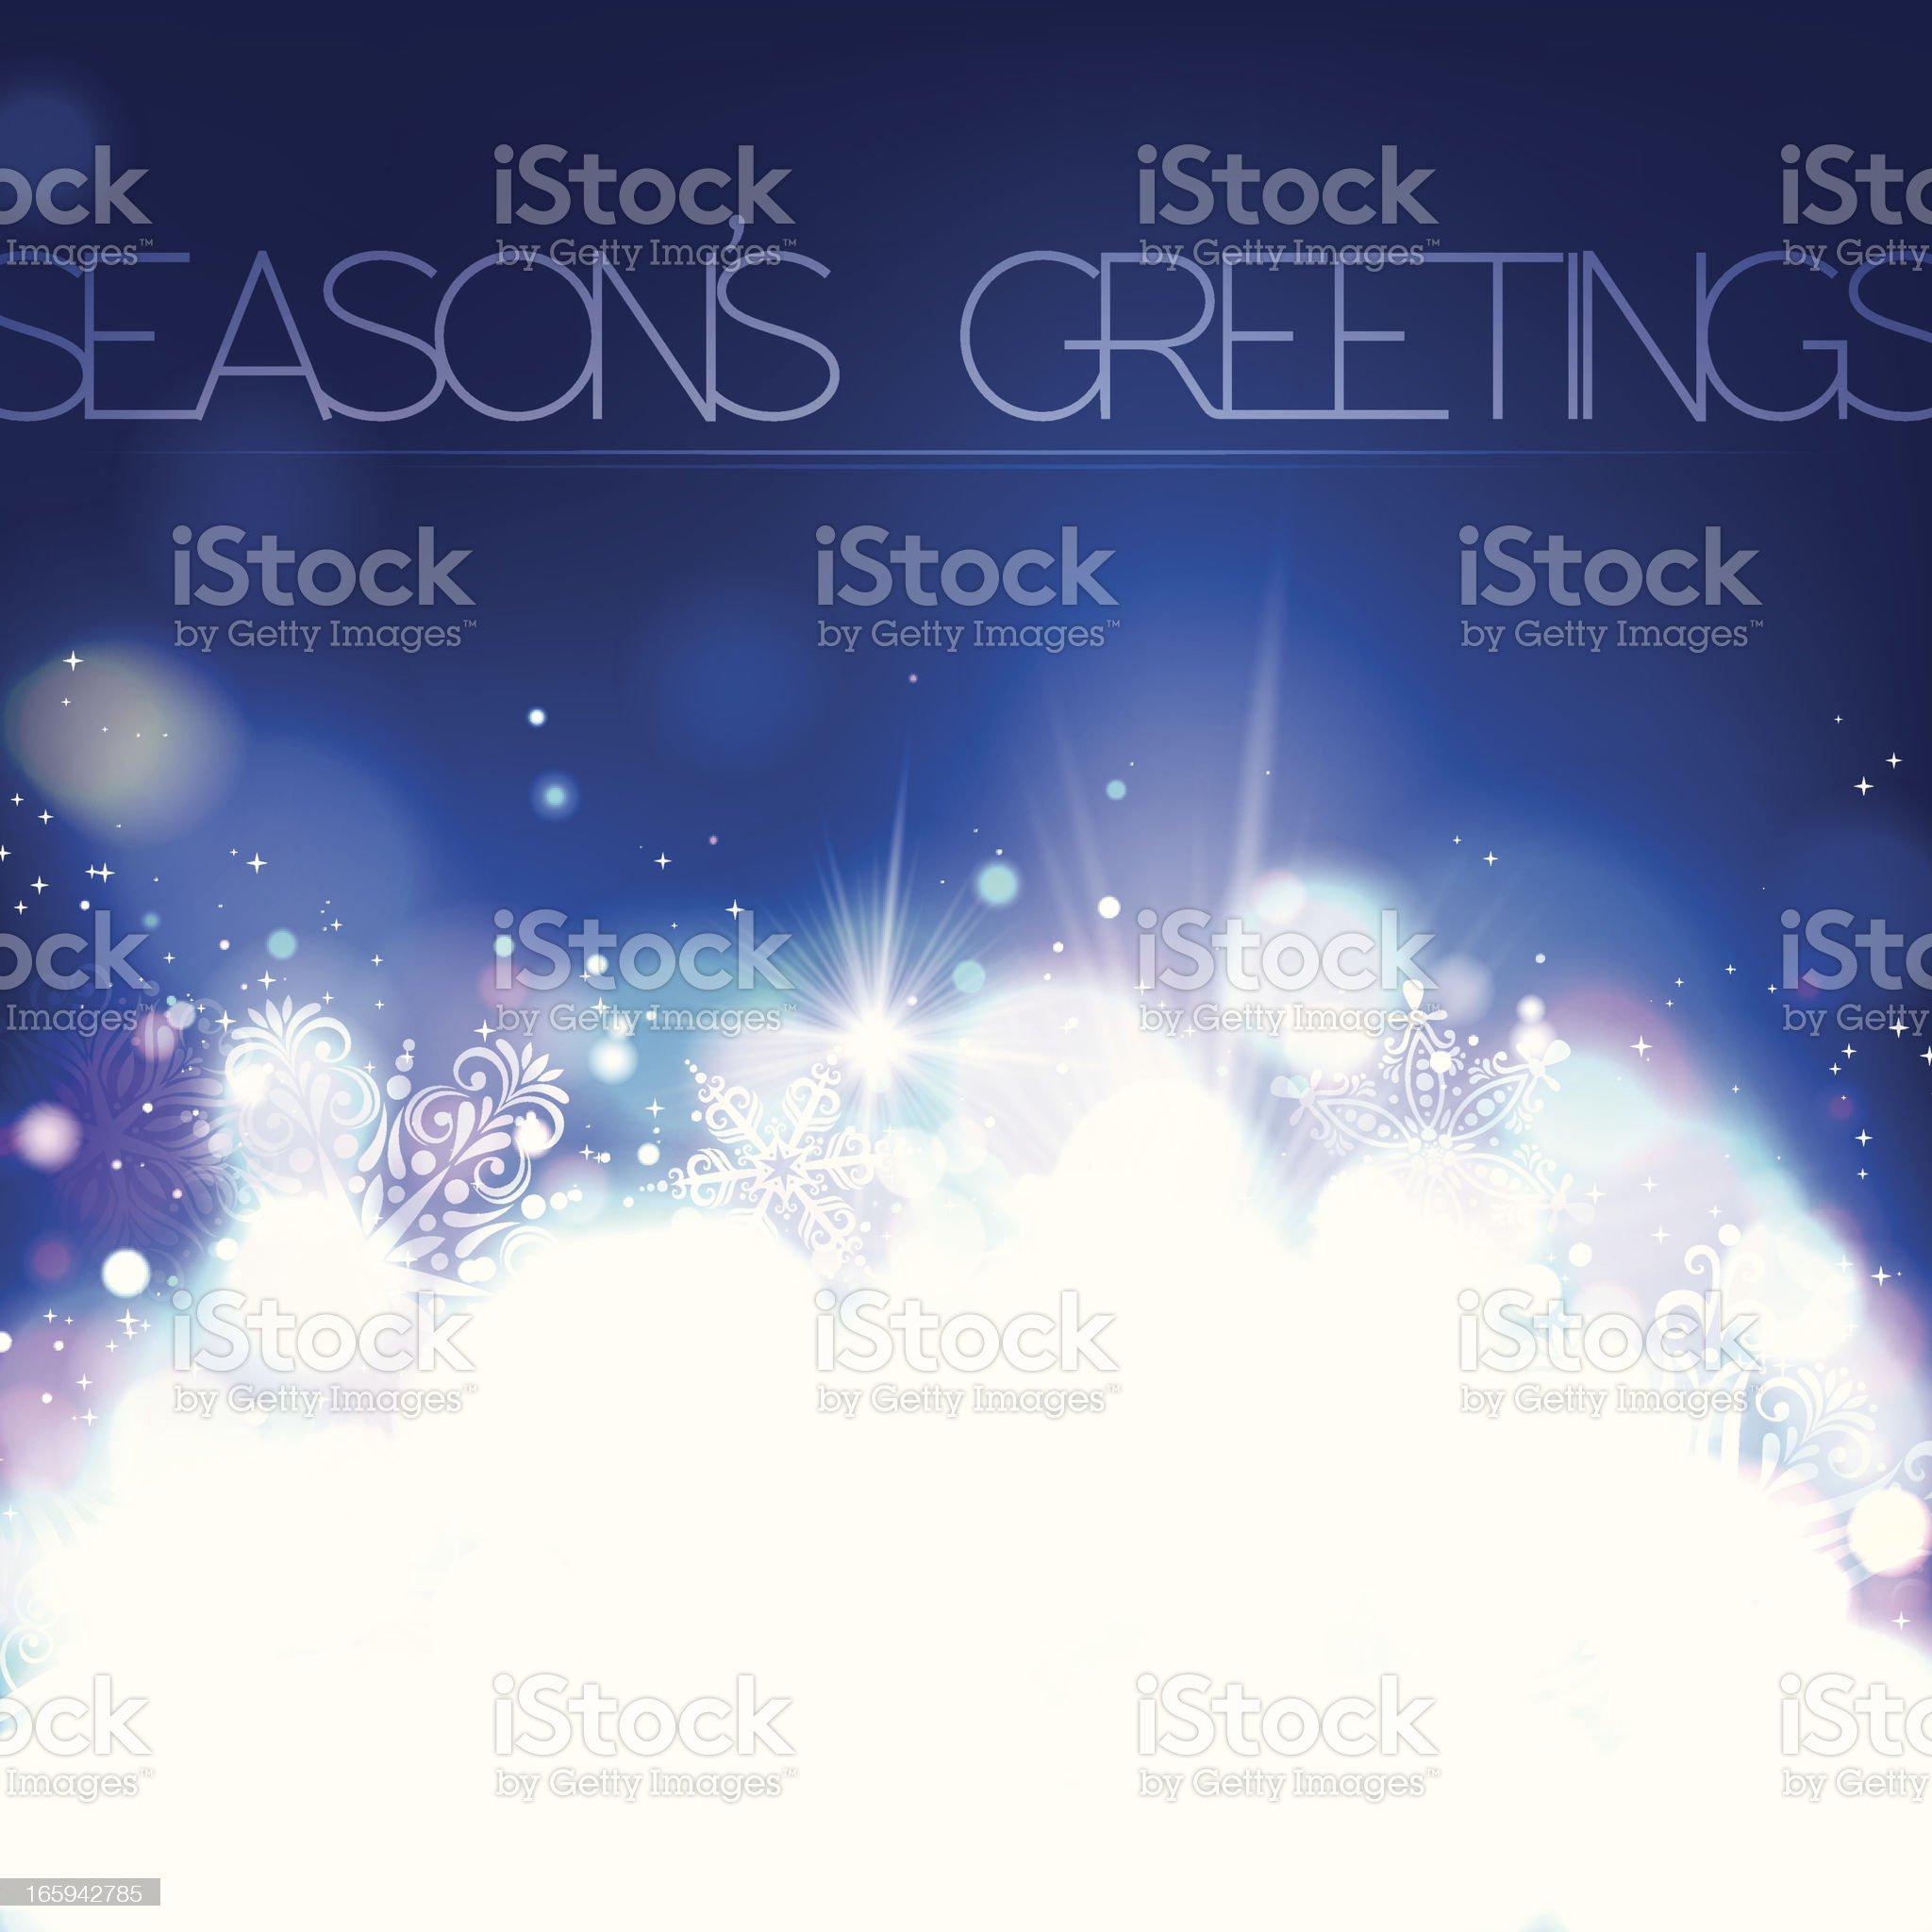 Season's greetings white sparkle graphic royalty-free stock vector art